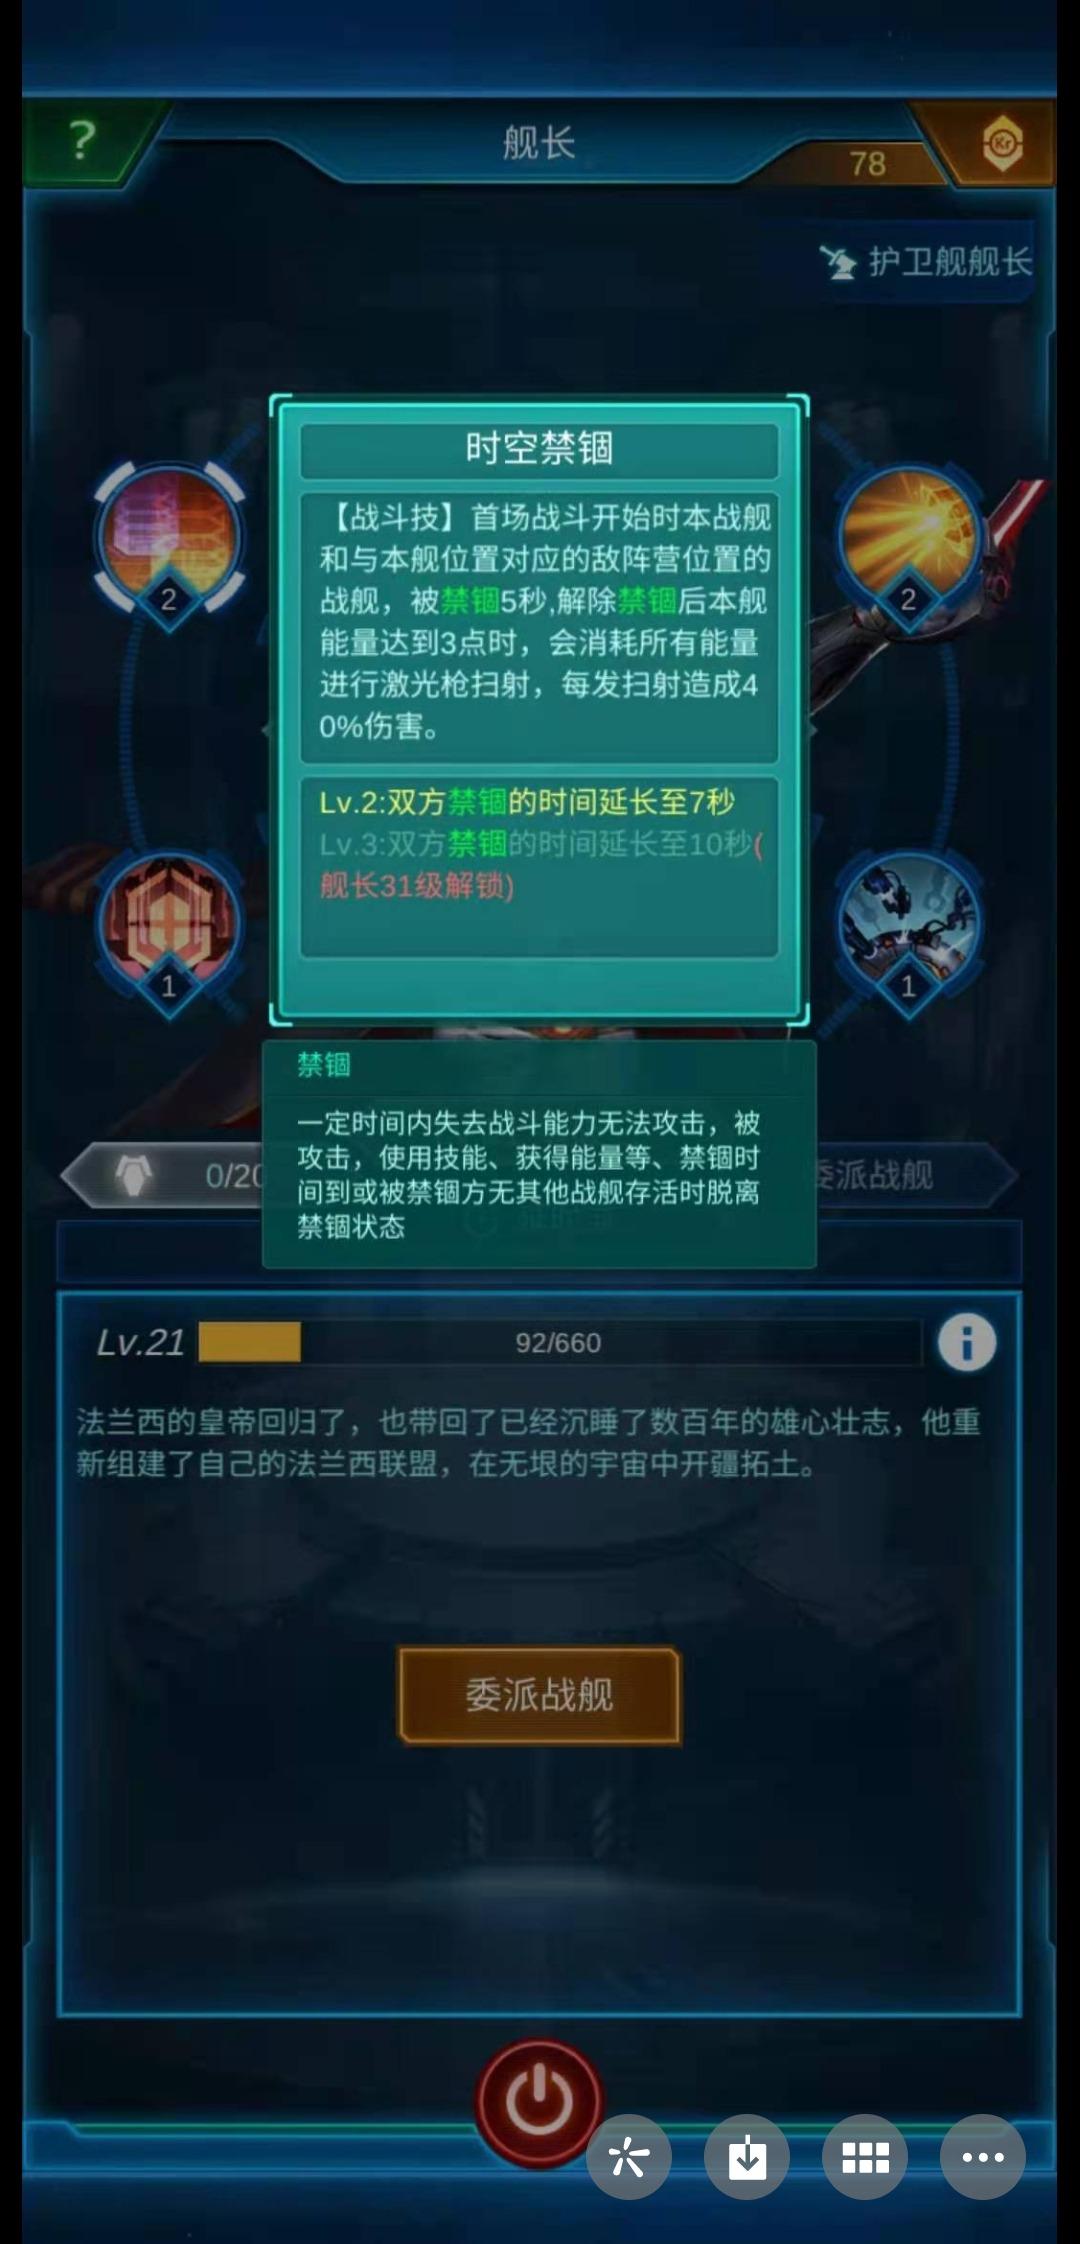 Screenshot_2021-04-03-18-42-29-927_com.tencent.mm.jpg